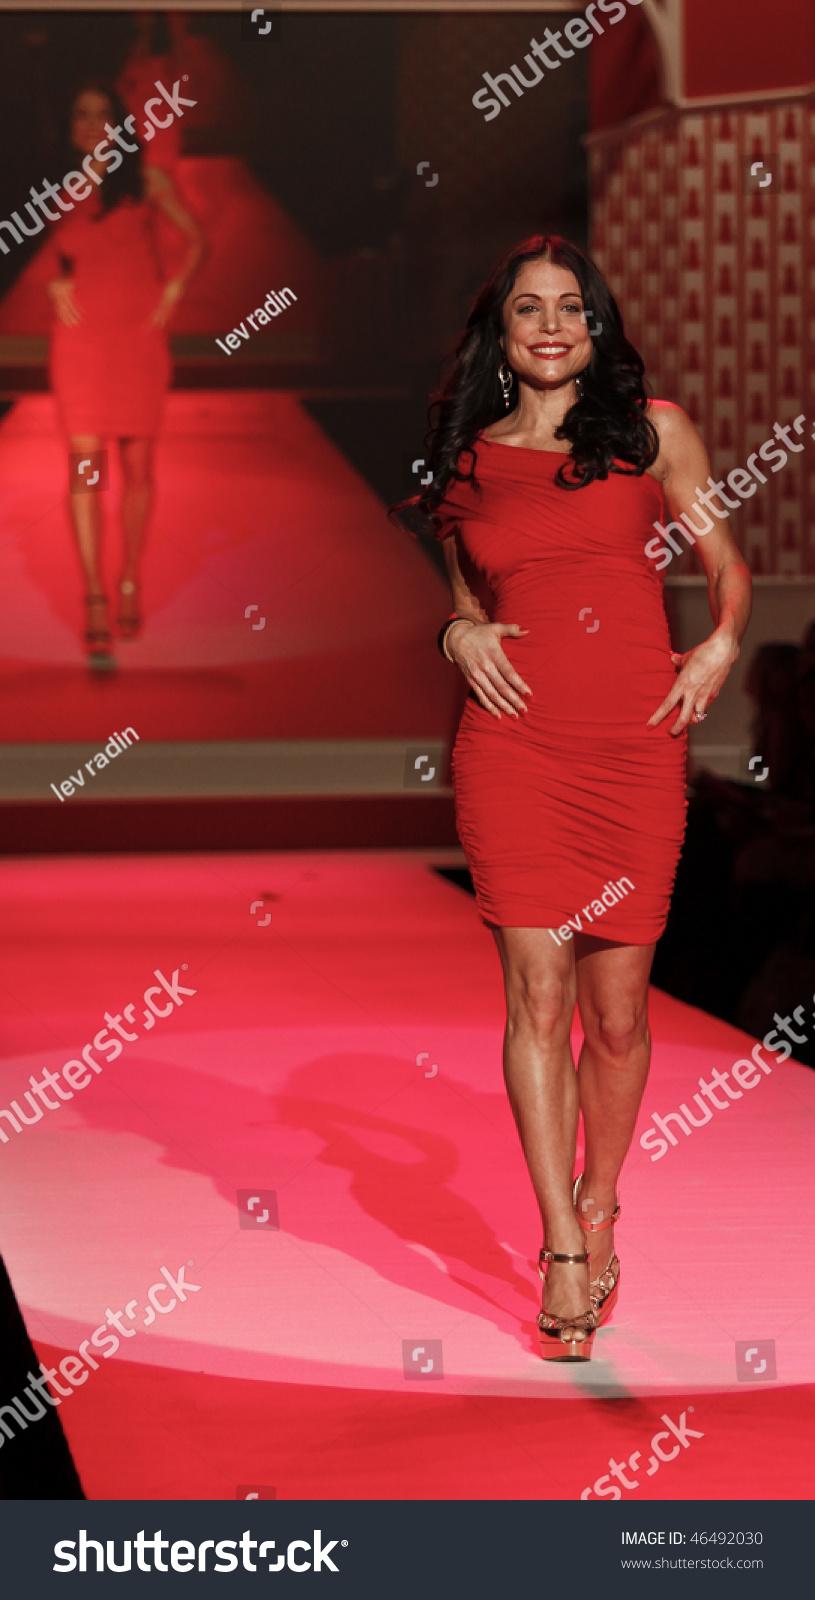 Celebrity Bethany Benz nude (81 photo), Pussy, Hot, Twitter, cameltoe 2017